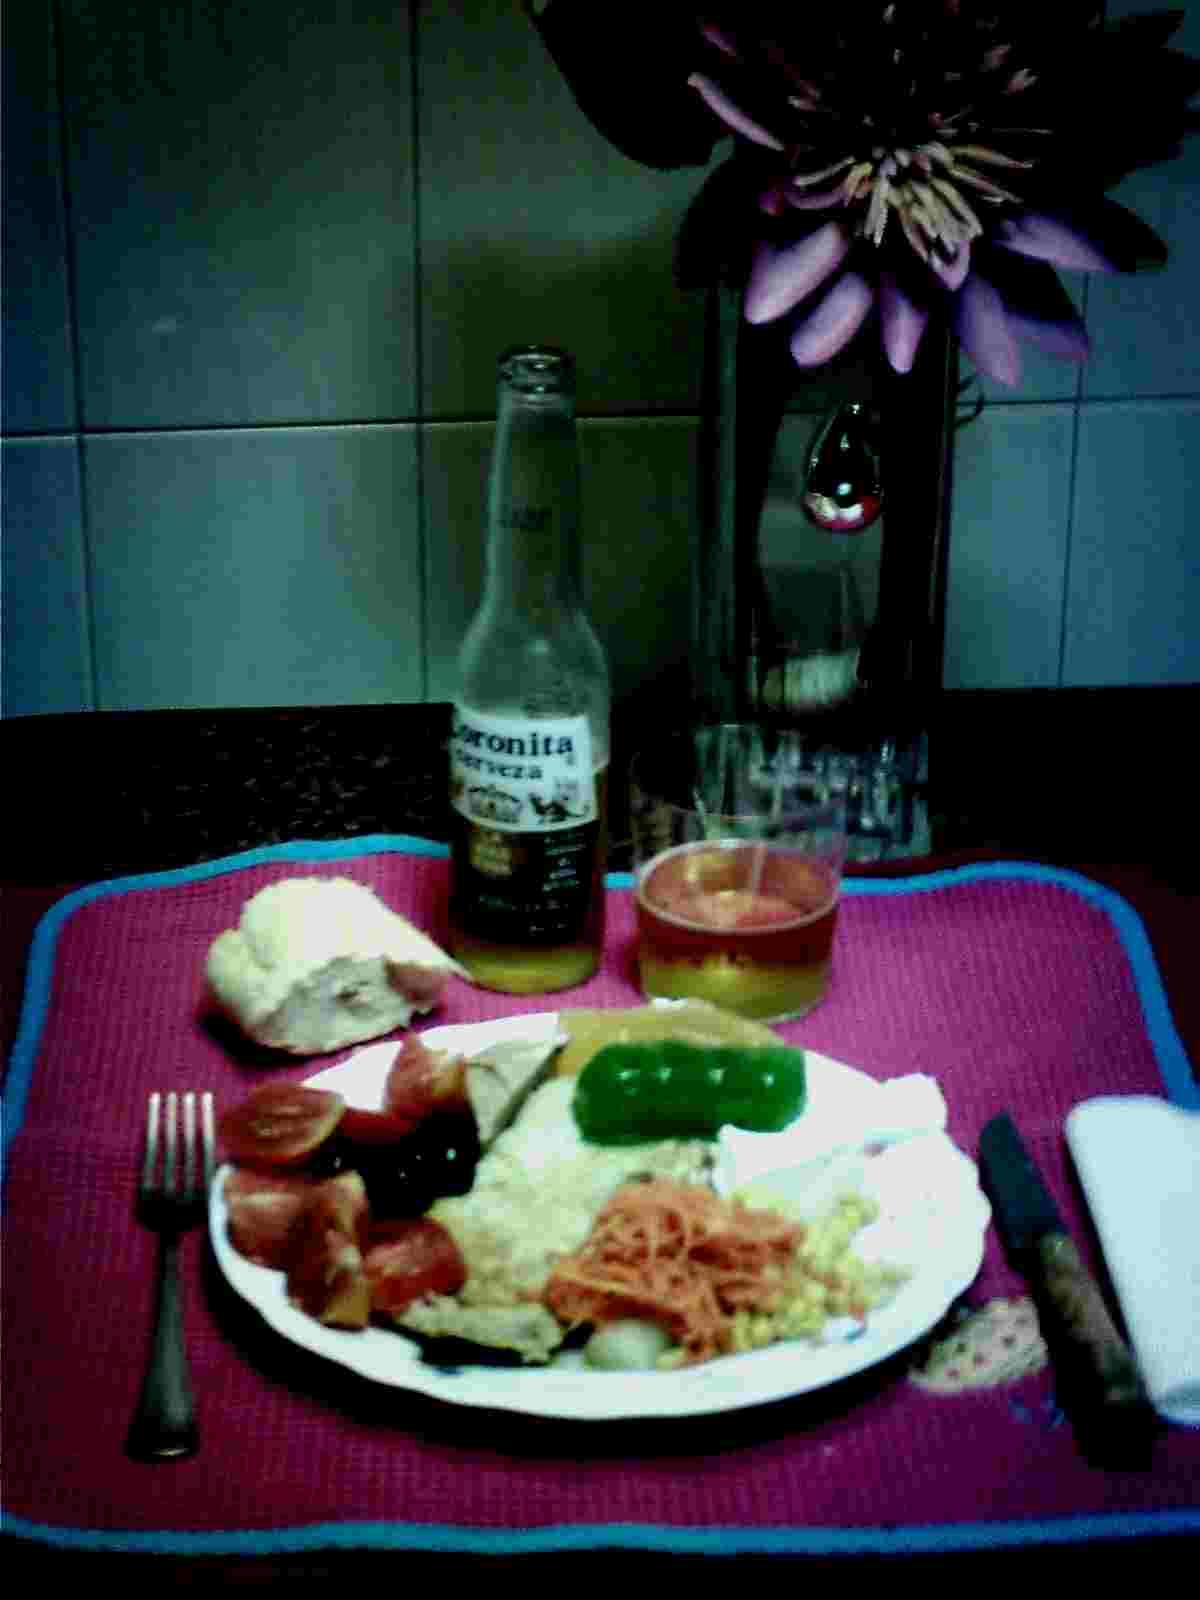 Filete Empanado, Tomate Natural, Aceituna Negra Carbonell, Zanahoria y Maíz Bonduelle, Espárrago Helios, Dulce de Manzana El Gaitero, Dulce de Ciruela Vereterra, Queso Philadelphia, Aceite de Oliva Virgen Extra Carbonell, Pan, Cerveza Coronita.